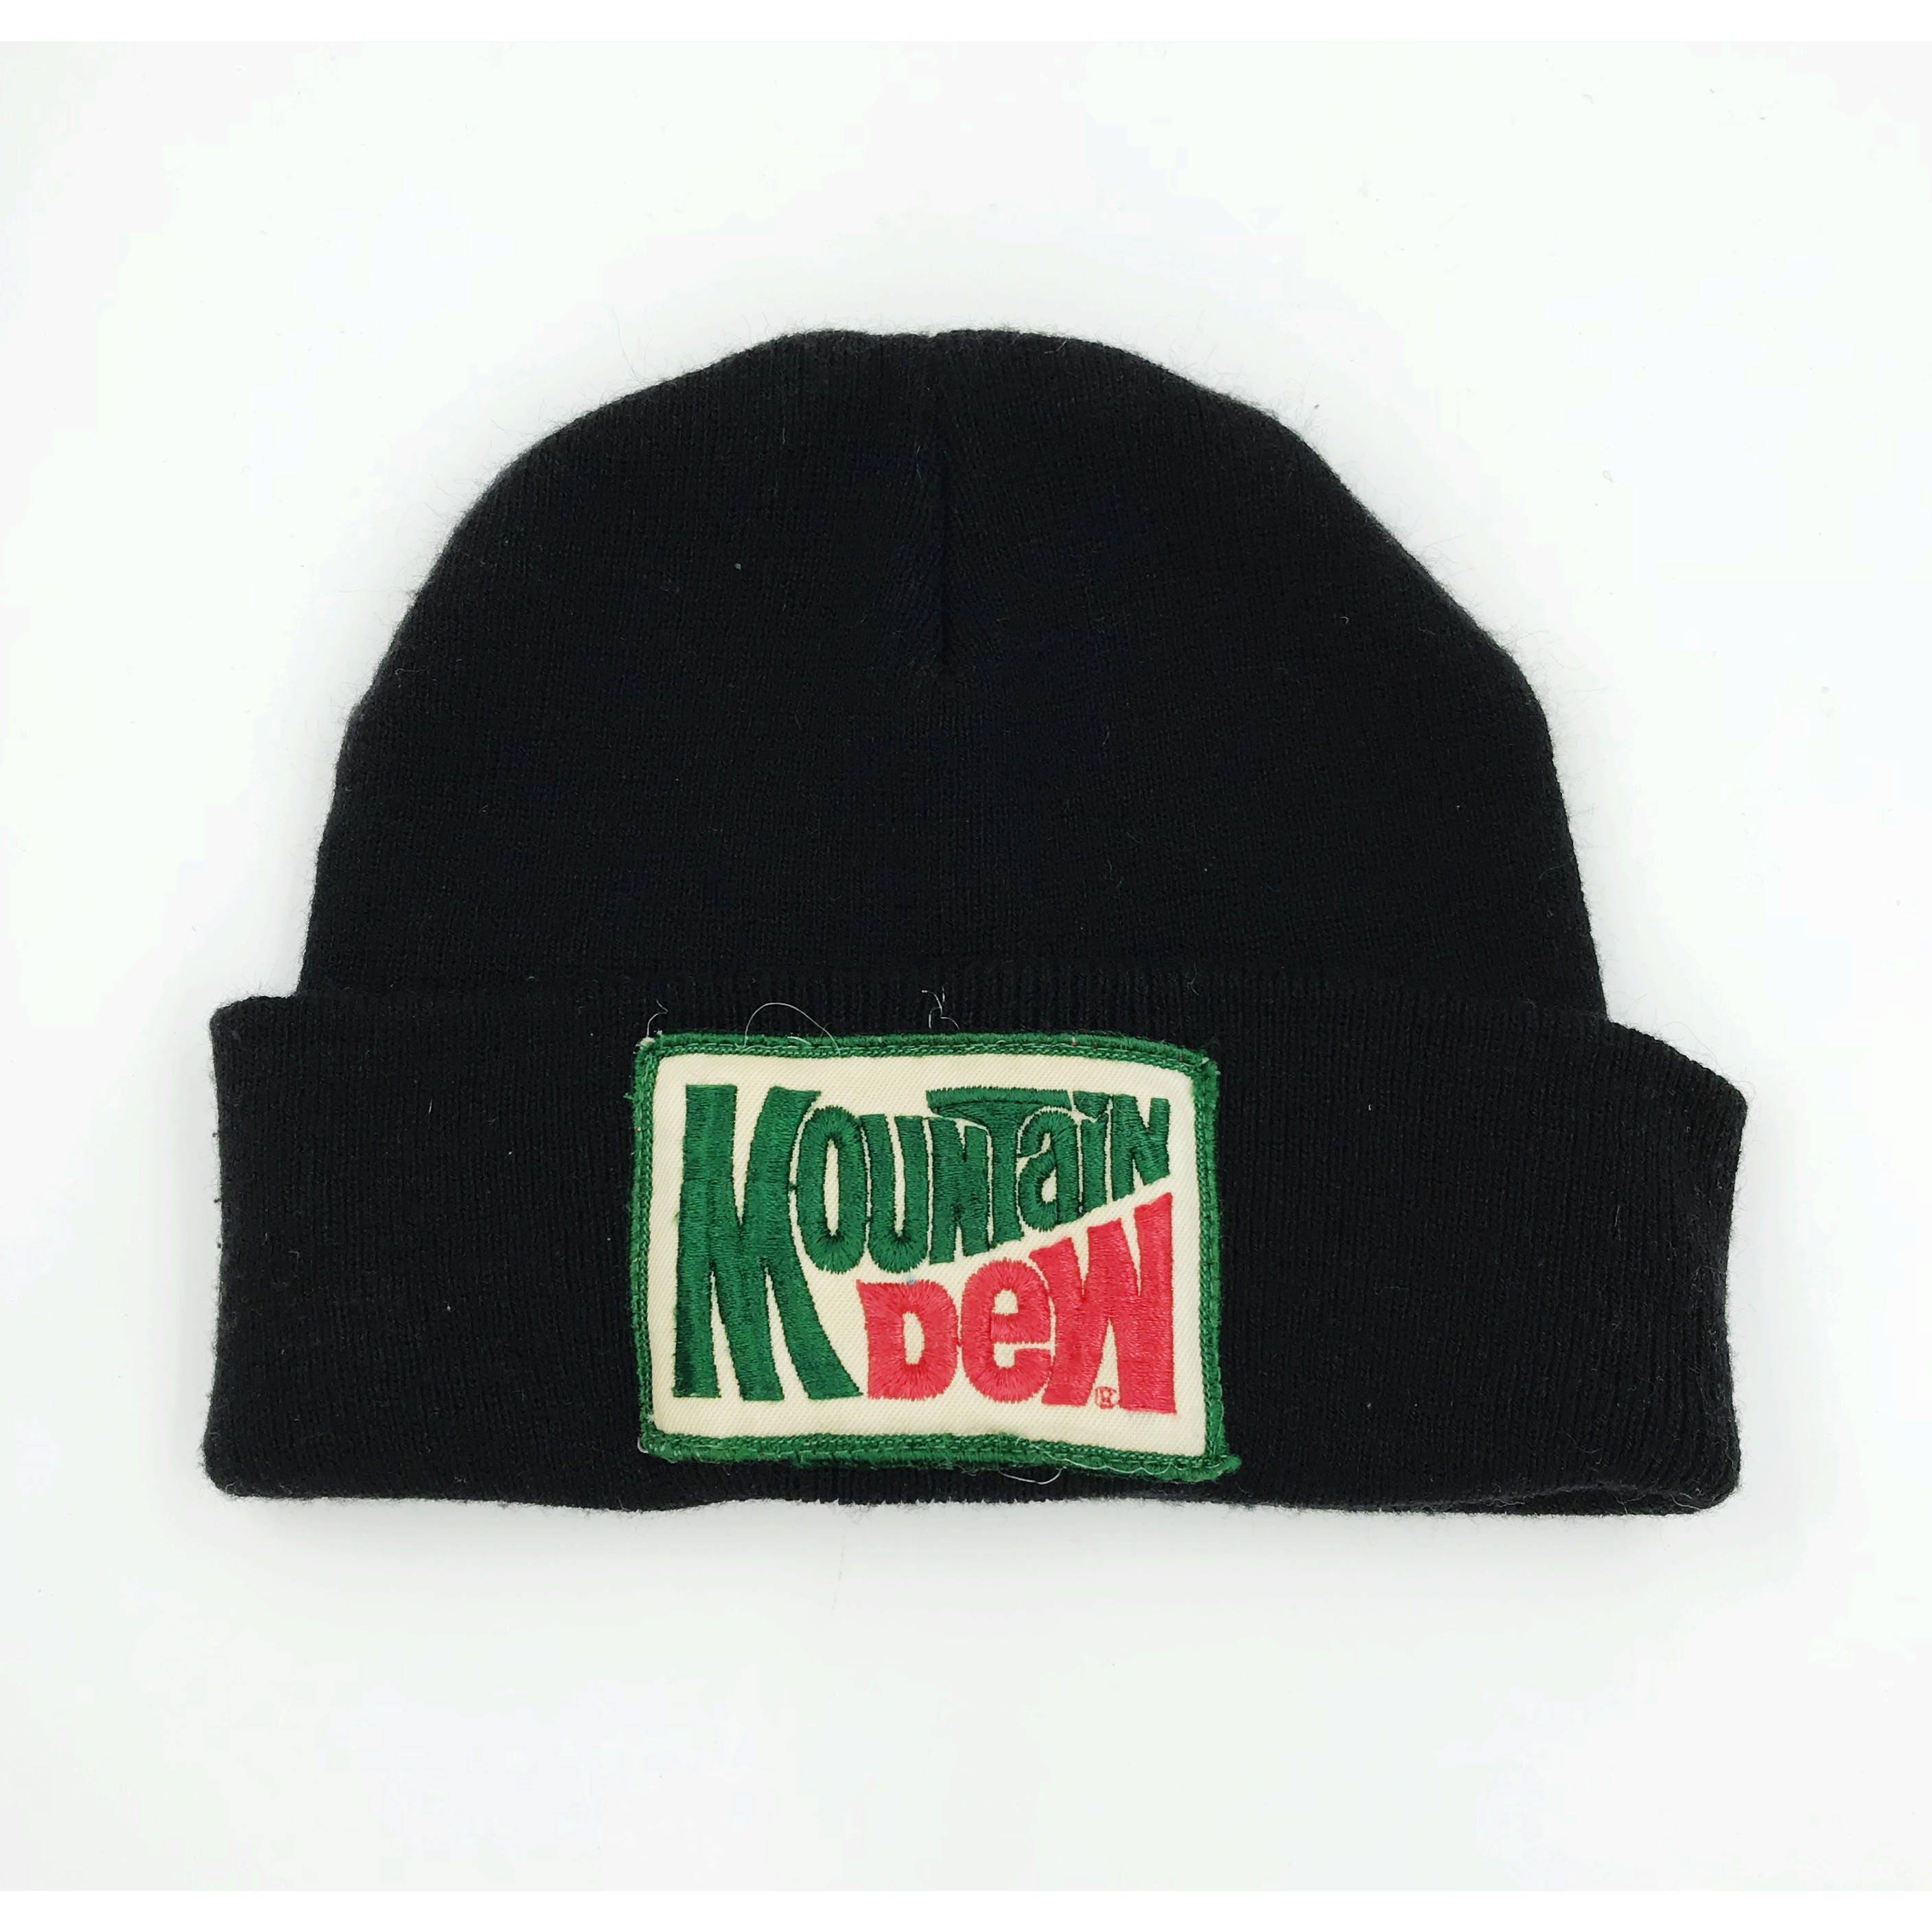 Mountain Dew Vintage Patch Beanie - Black Beanie Hat Soda Logo ... dd525d0c26b